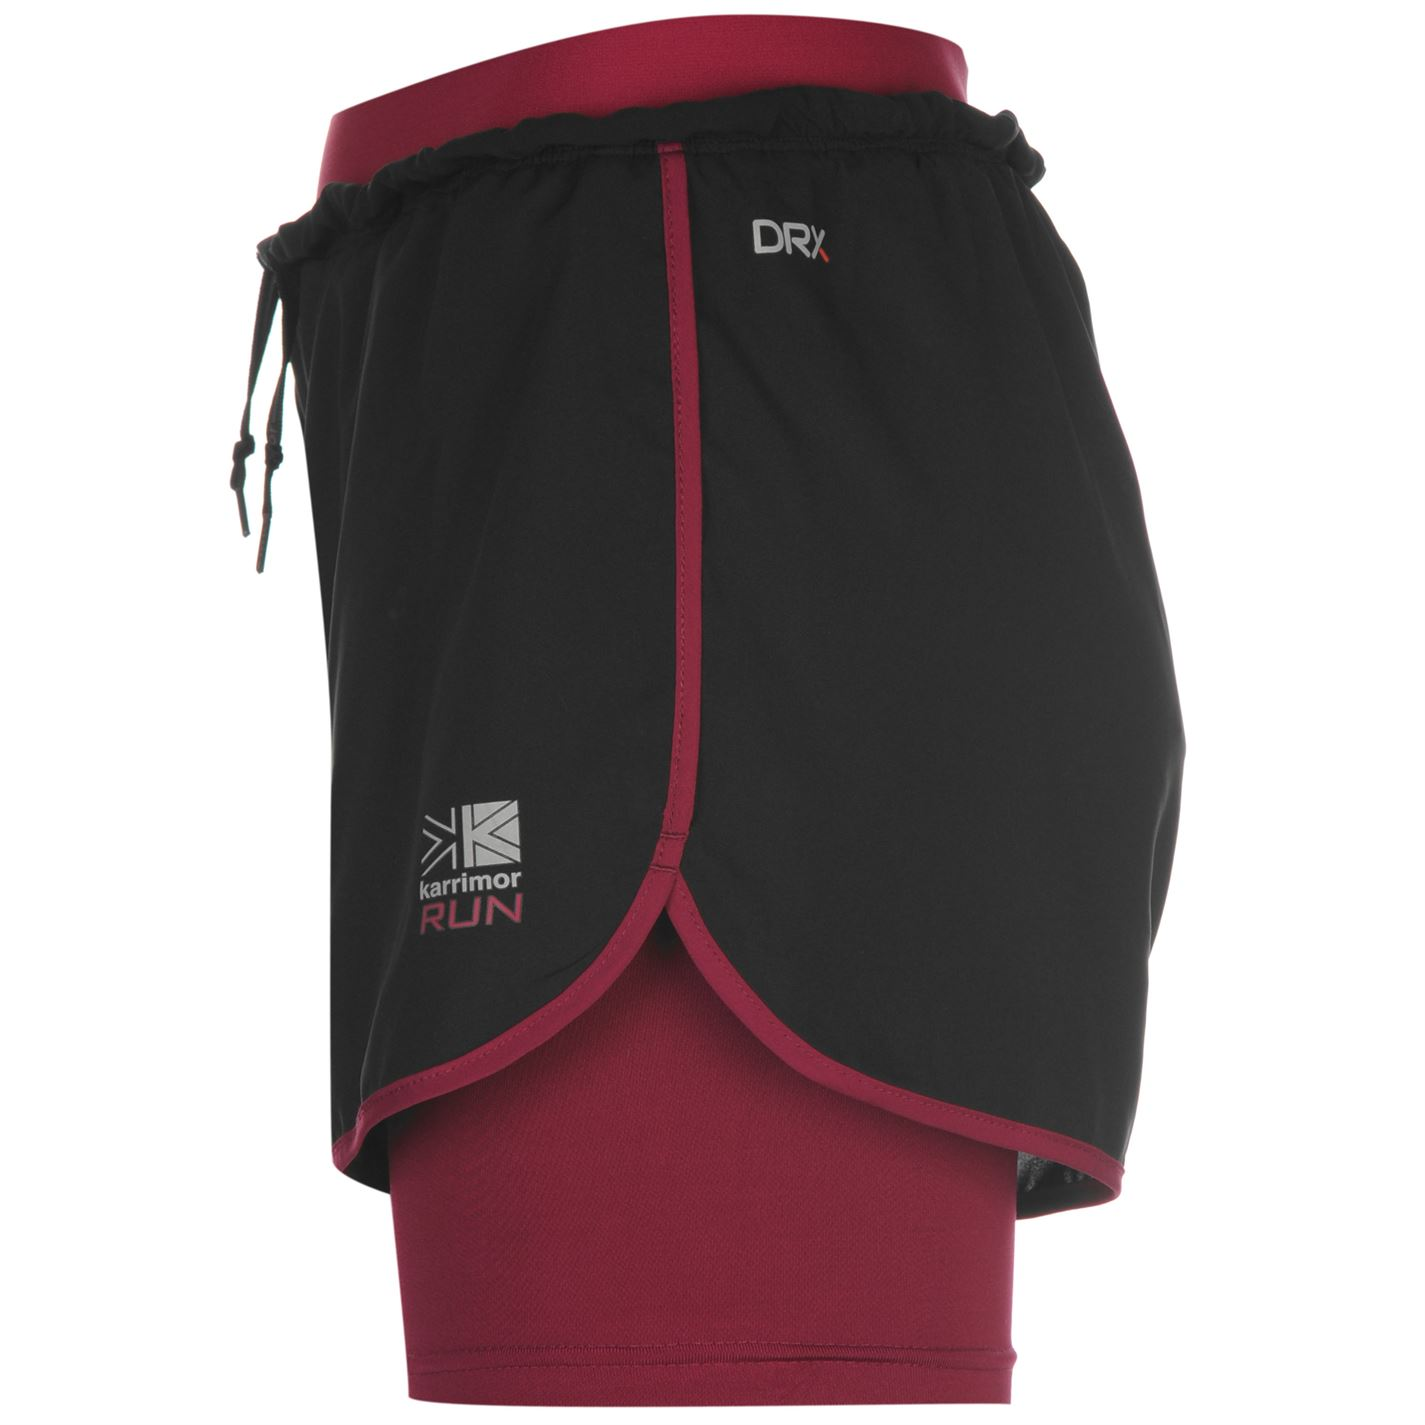 e5bd81ff1 Karrimor Ladies X 2 in 1 Running Shorts Pants Lightweight Drawstring  Clothing | eBay